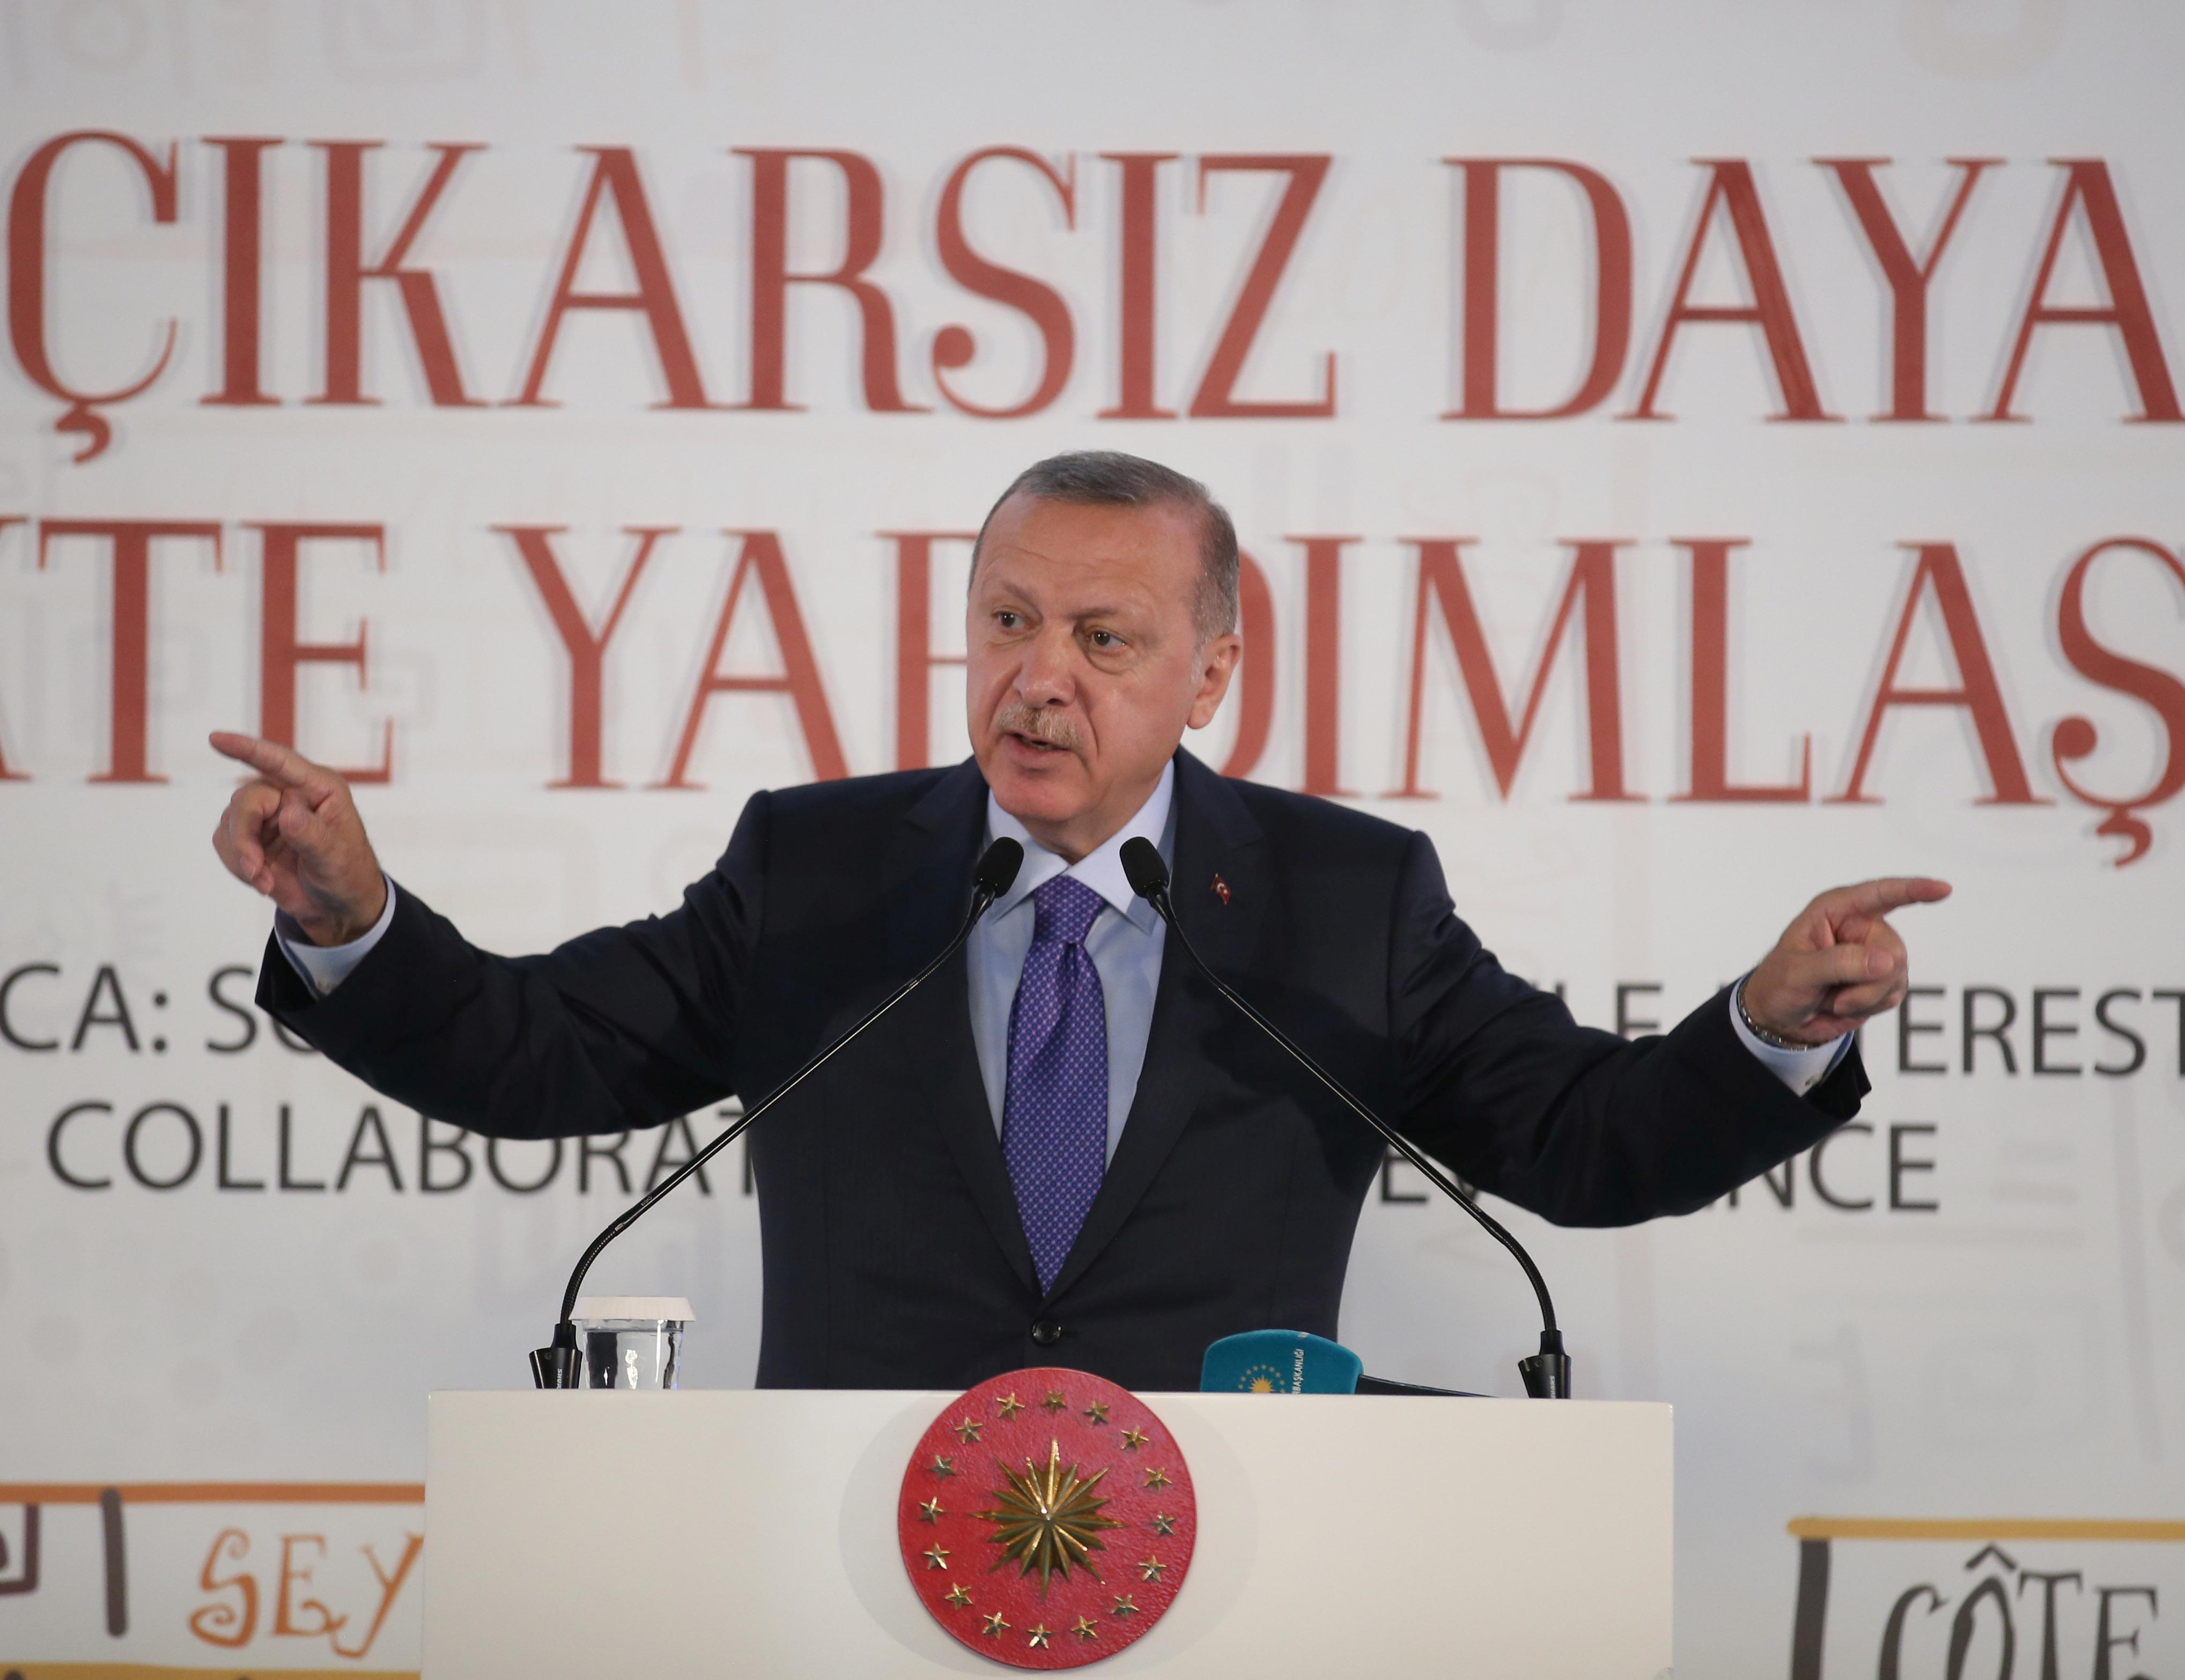 Erdogan says Turkey expects U.S. to keep promises, not stall Syria...